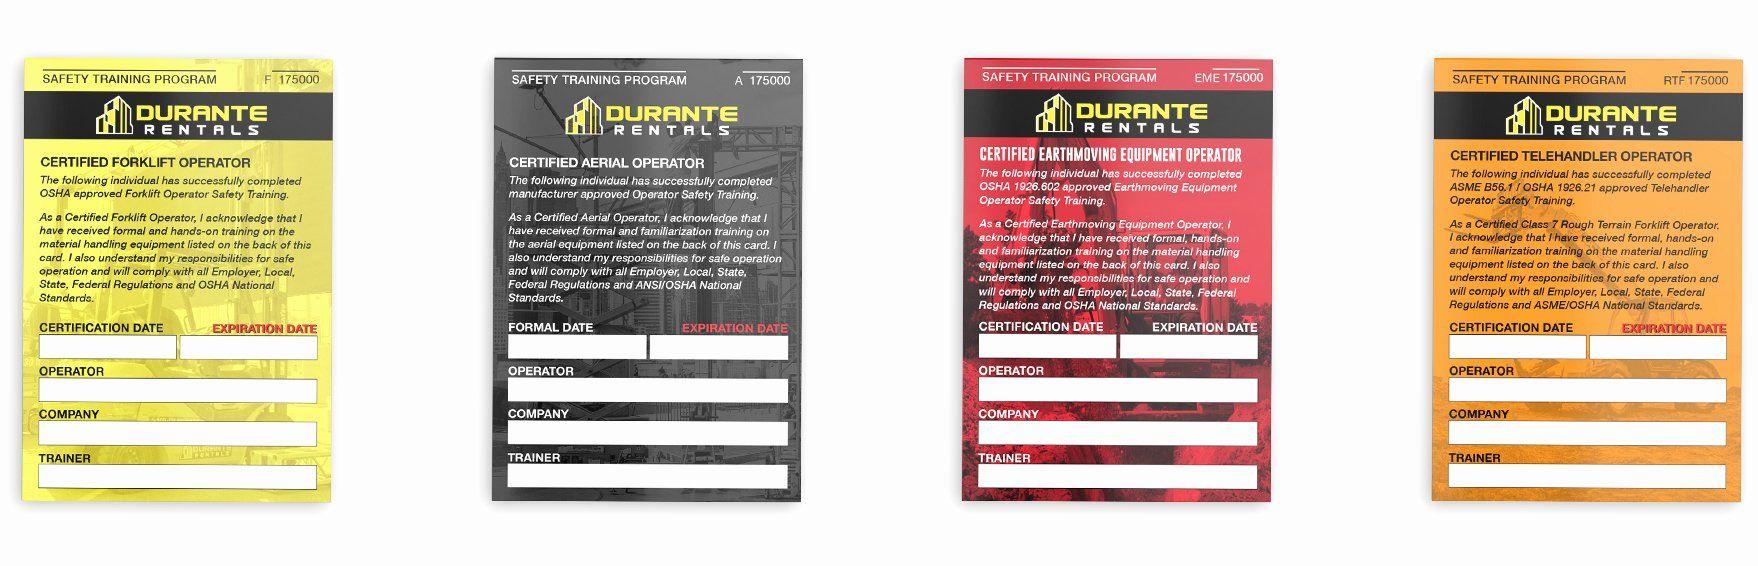 Equipment Operator Certification Card Template Elegant Construction Equipment Training Card Template Card Templates Printable Templates